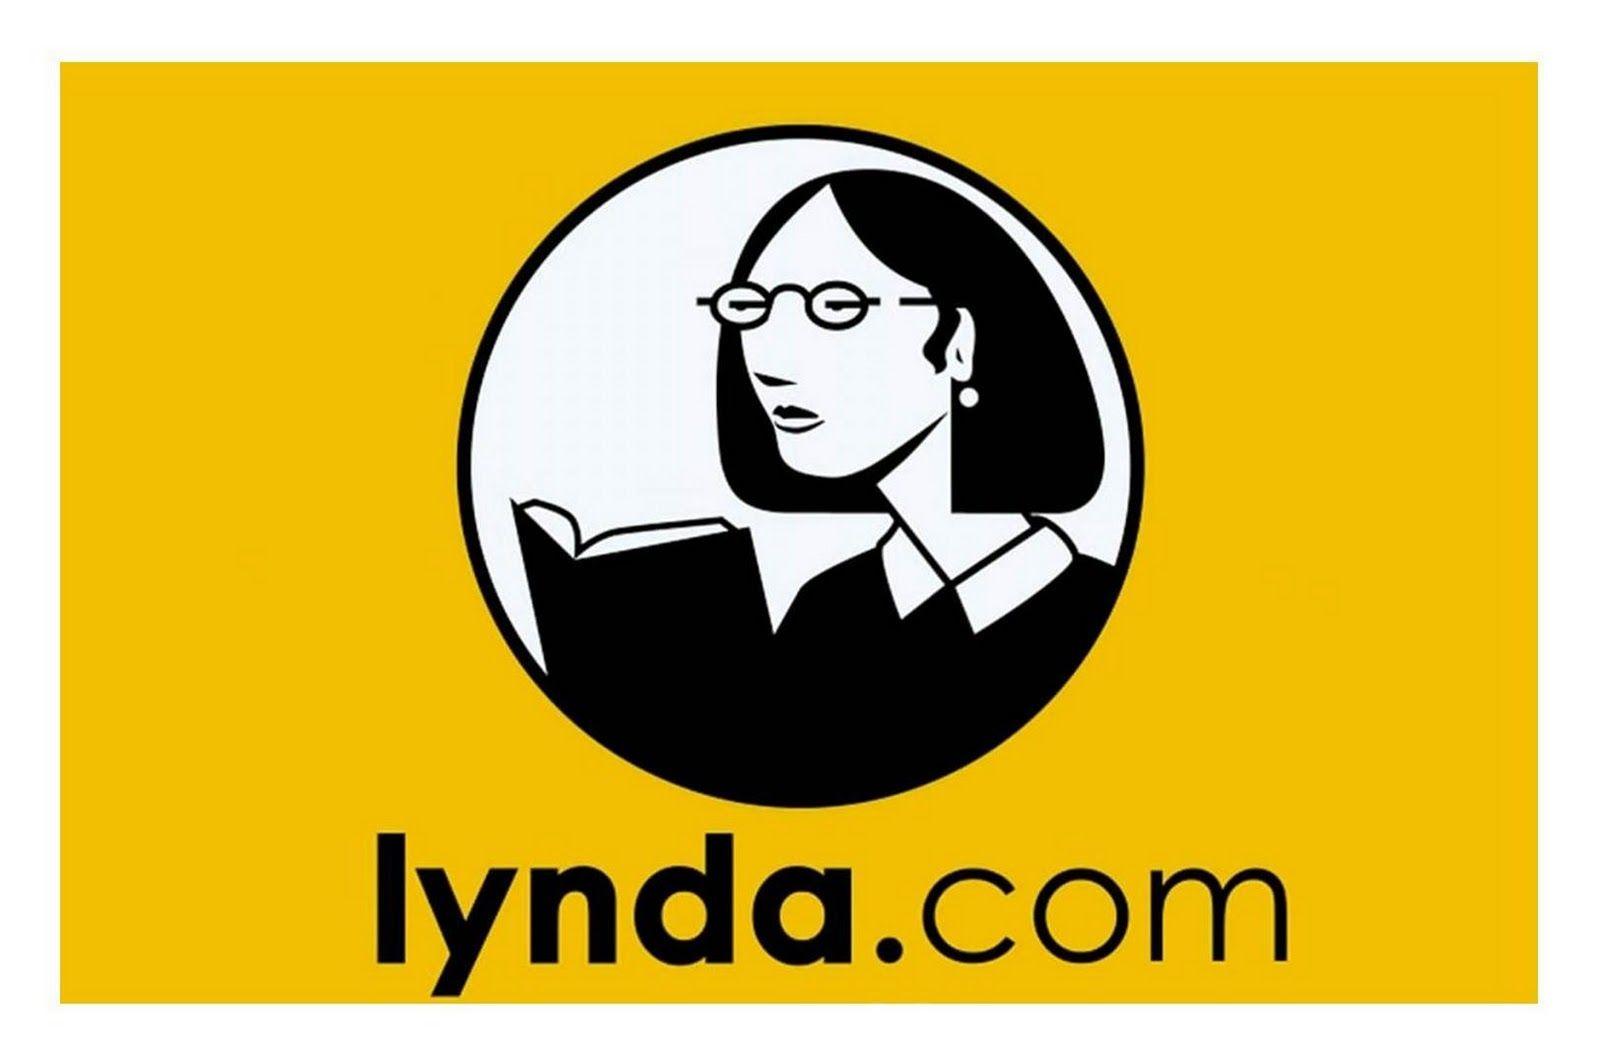 lynda_com-logo